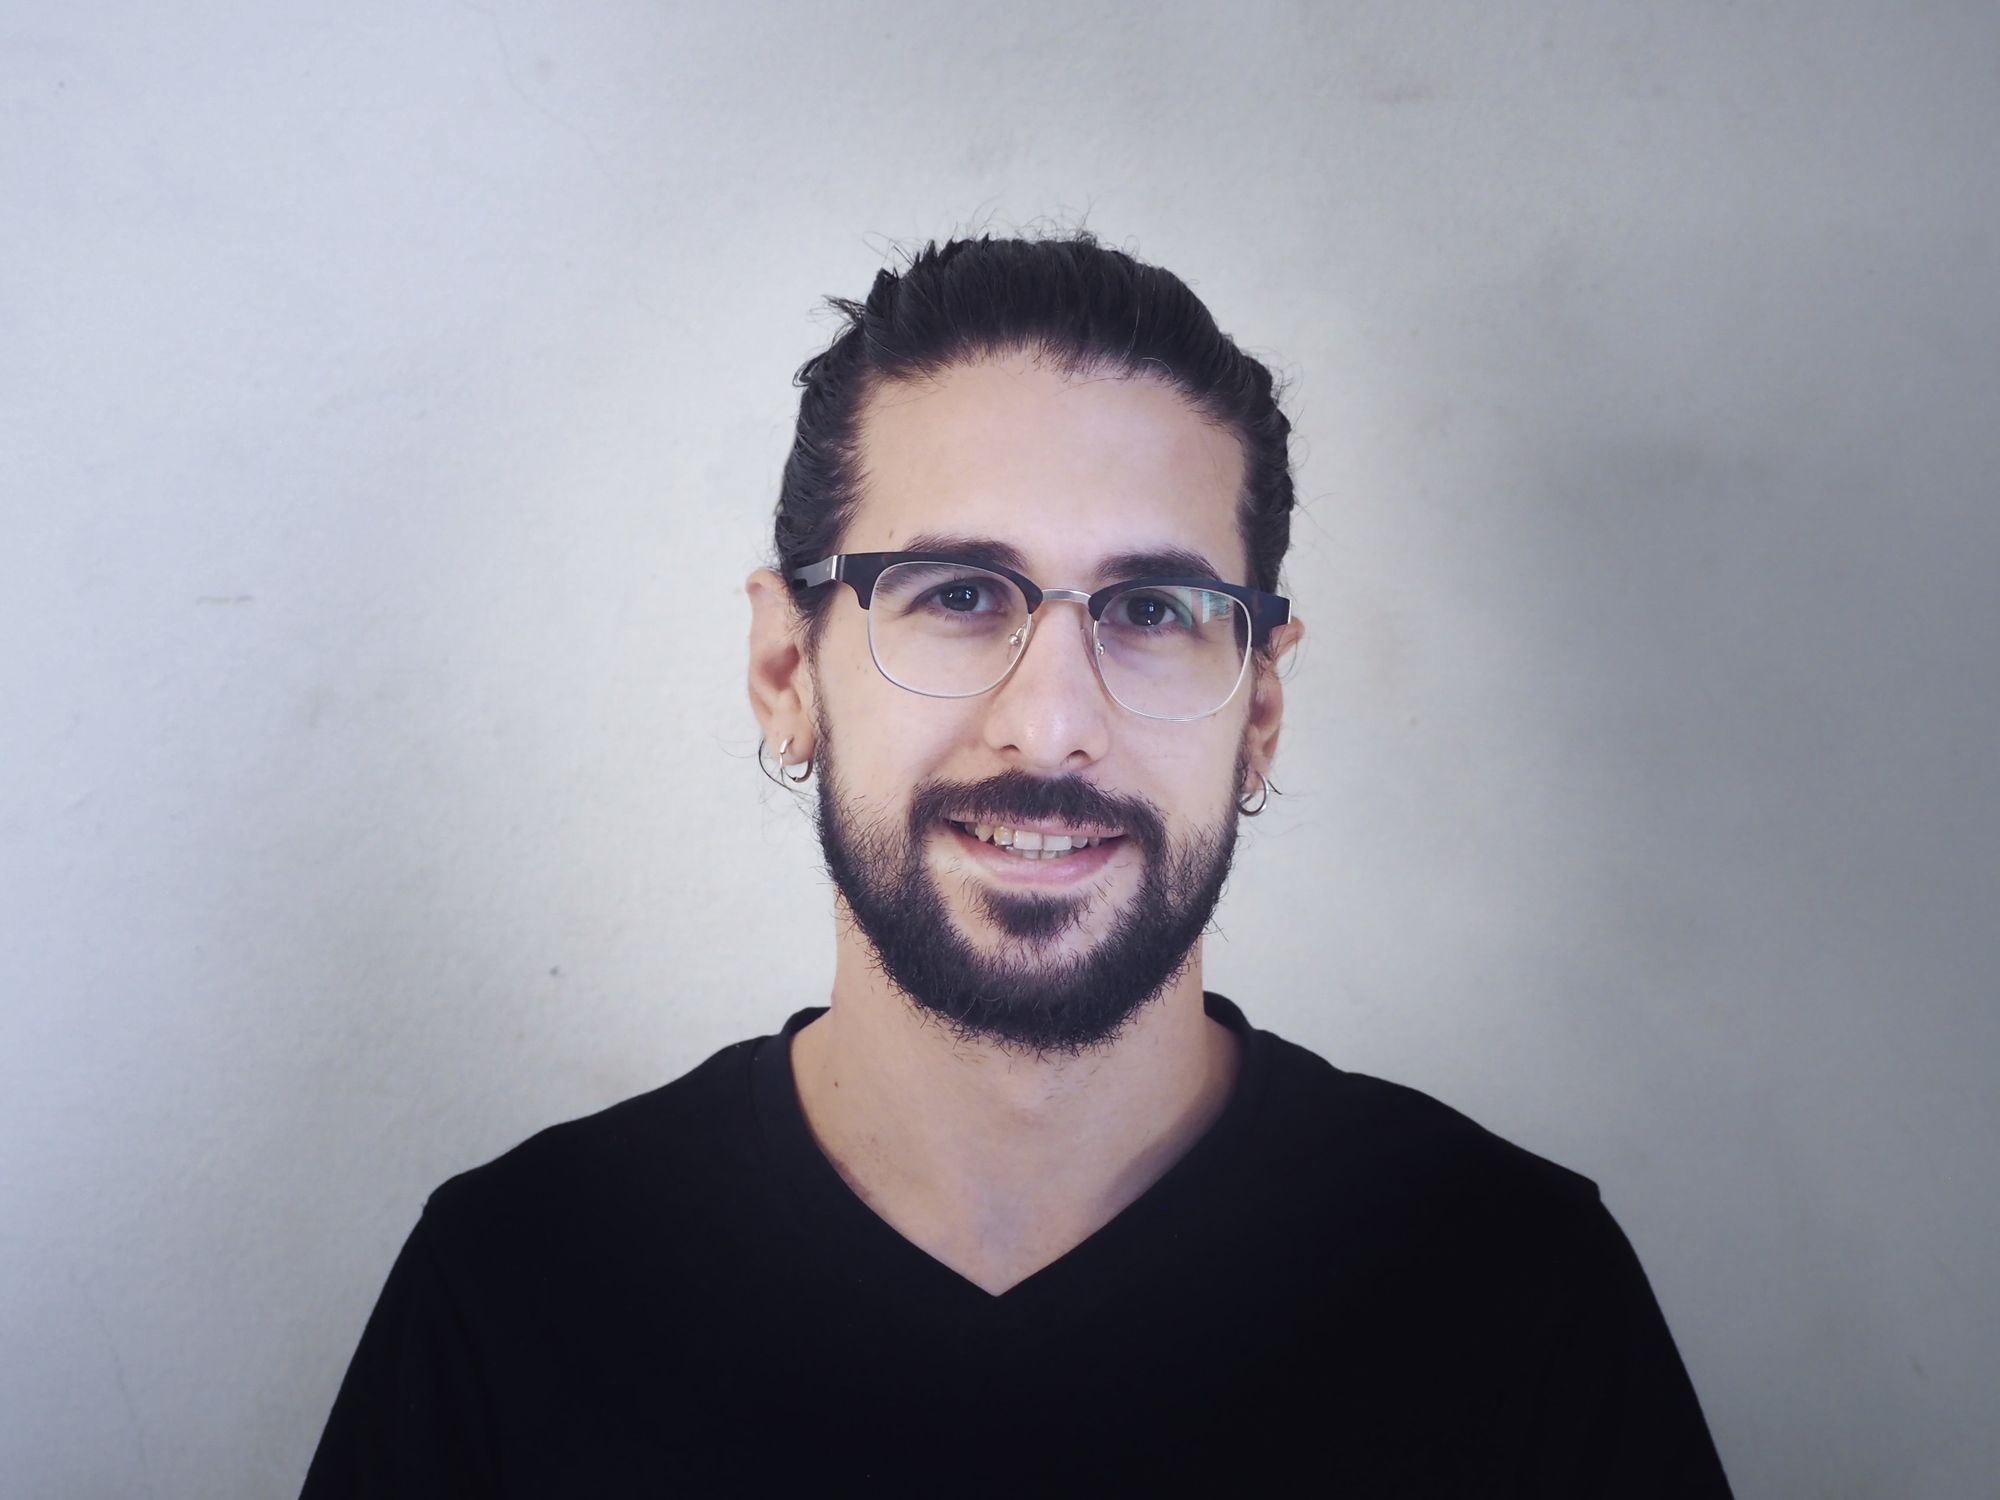 Ferran Reyes